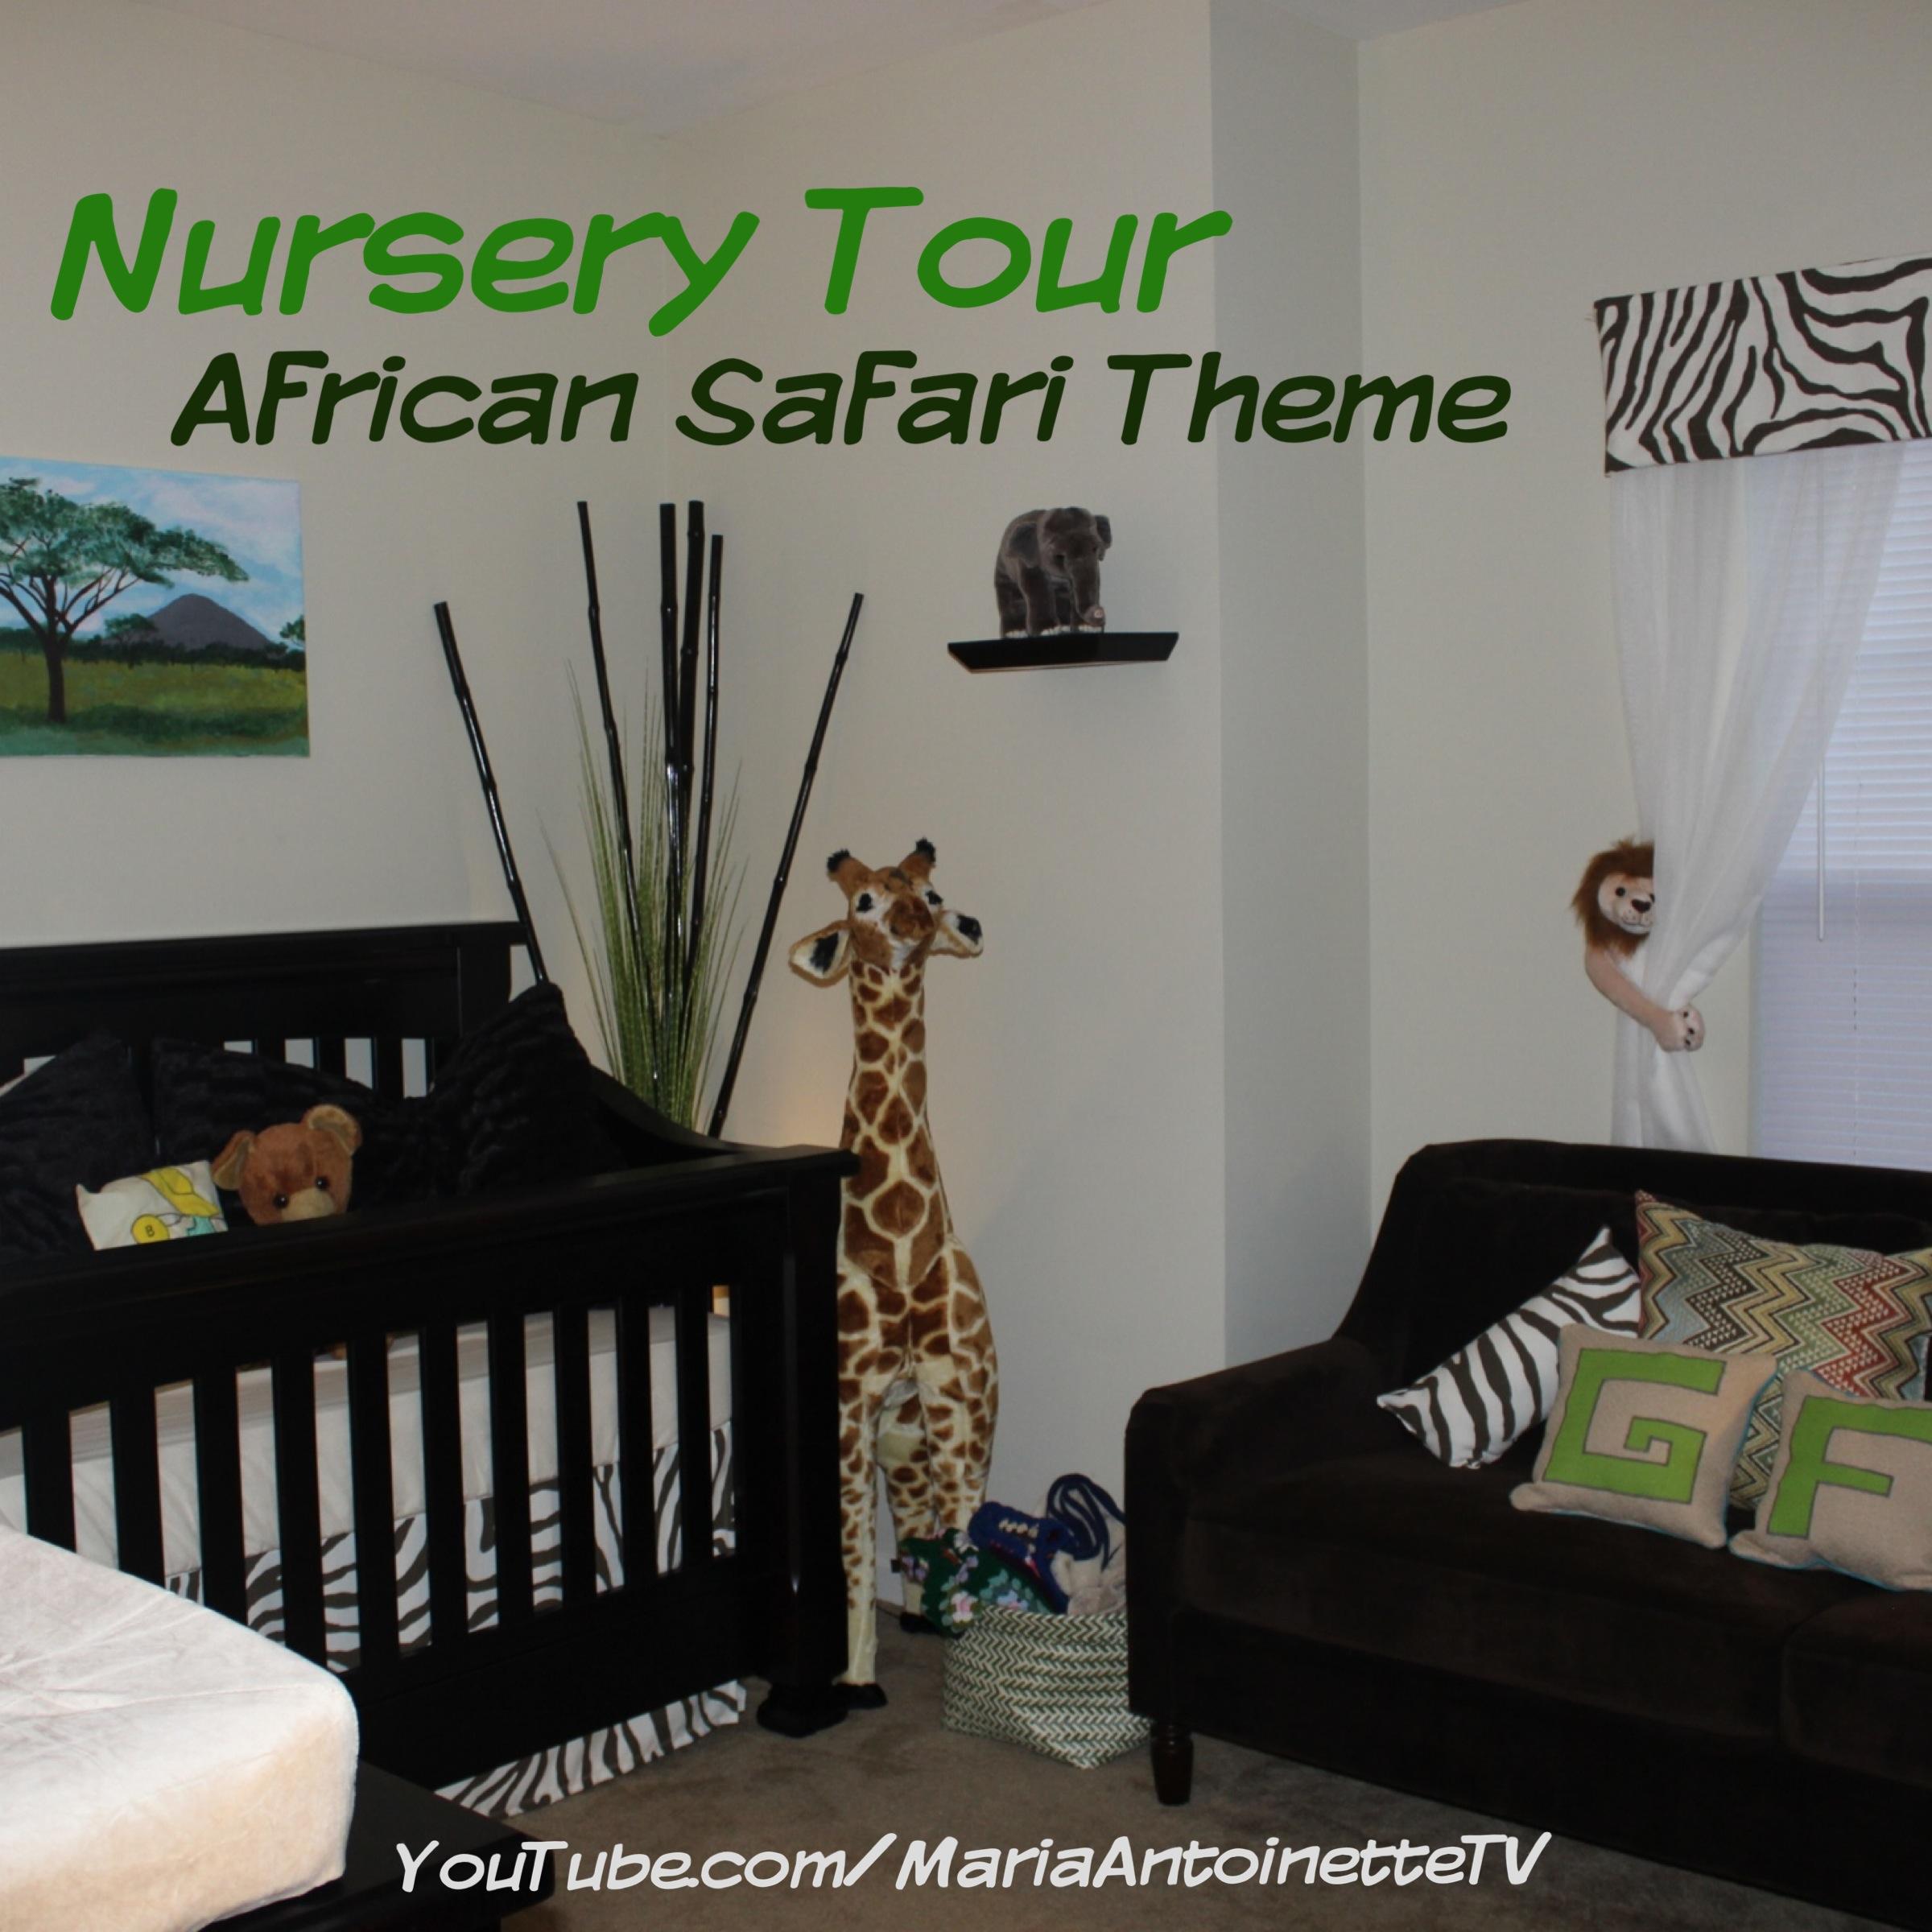 Nursery Tour – African Safari Theme